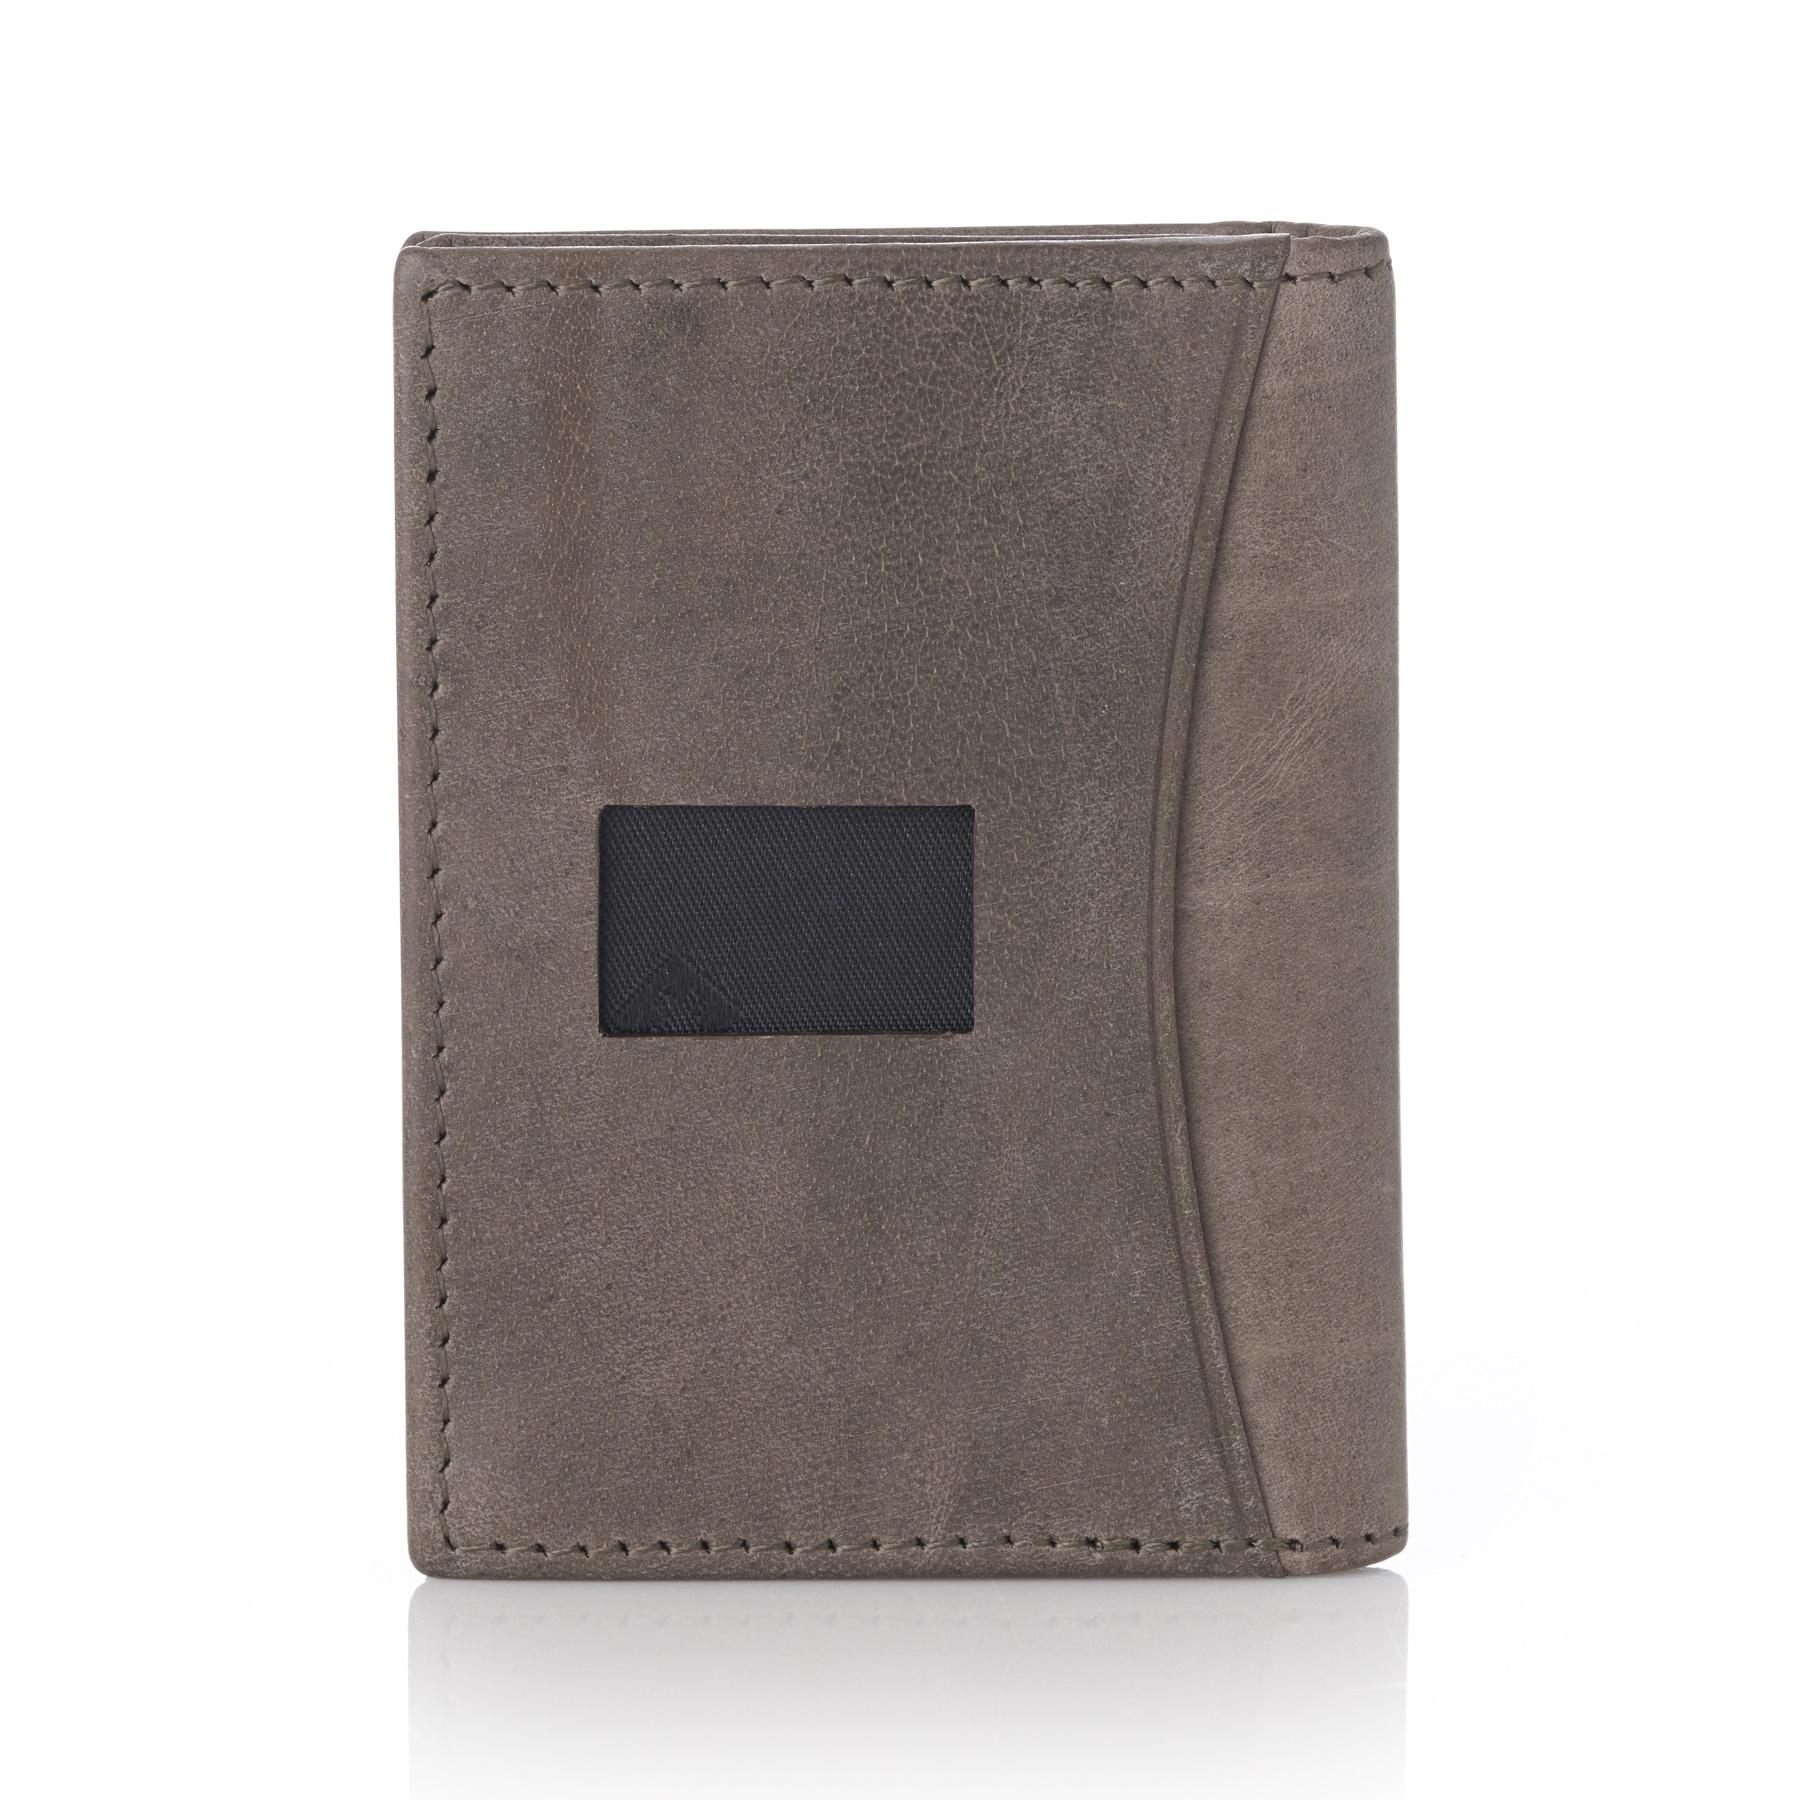 Alpine-Swiss-RFID-Leather-Business-Card-Wallet-Minimalist-ID-Window-Card-Holder thumbnail 41